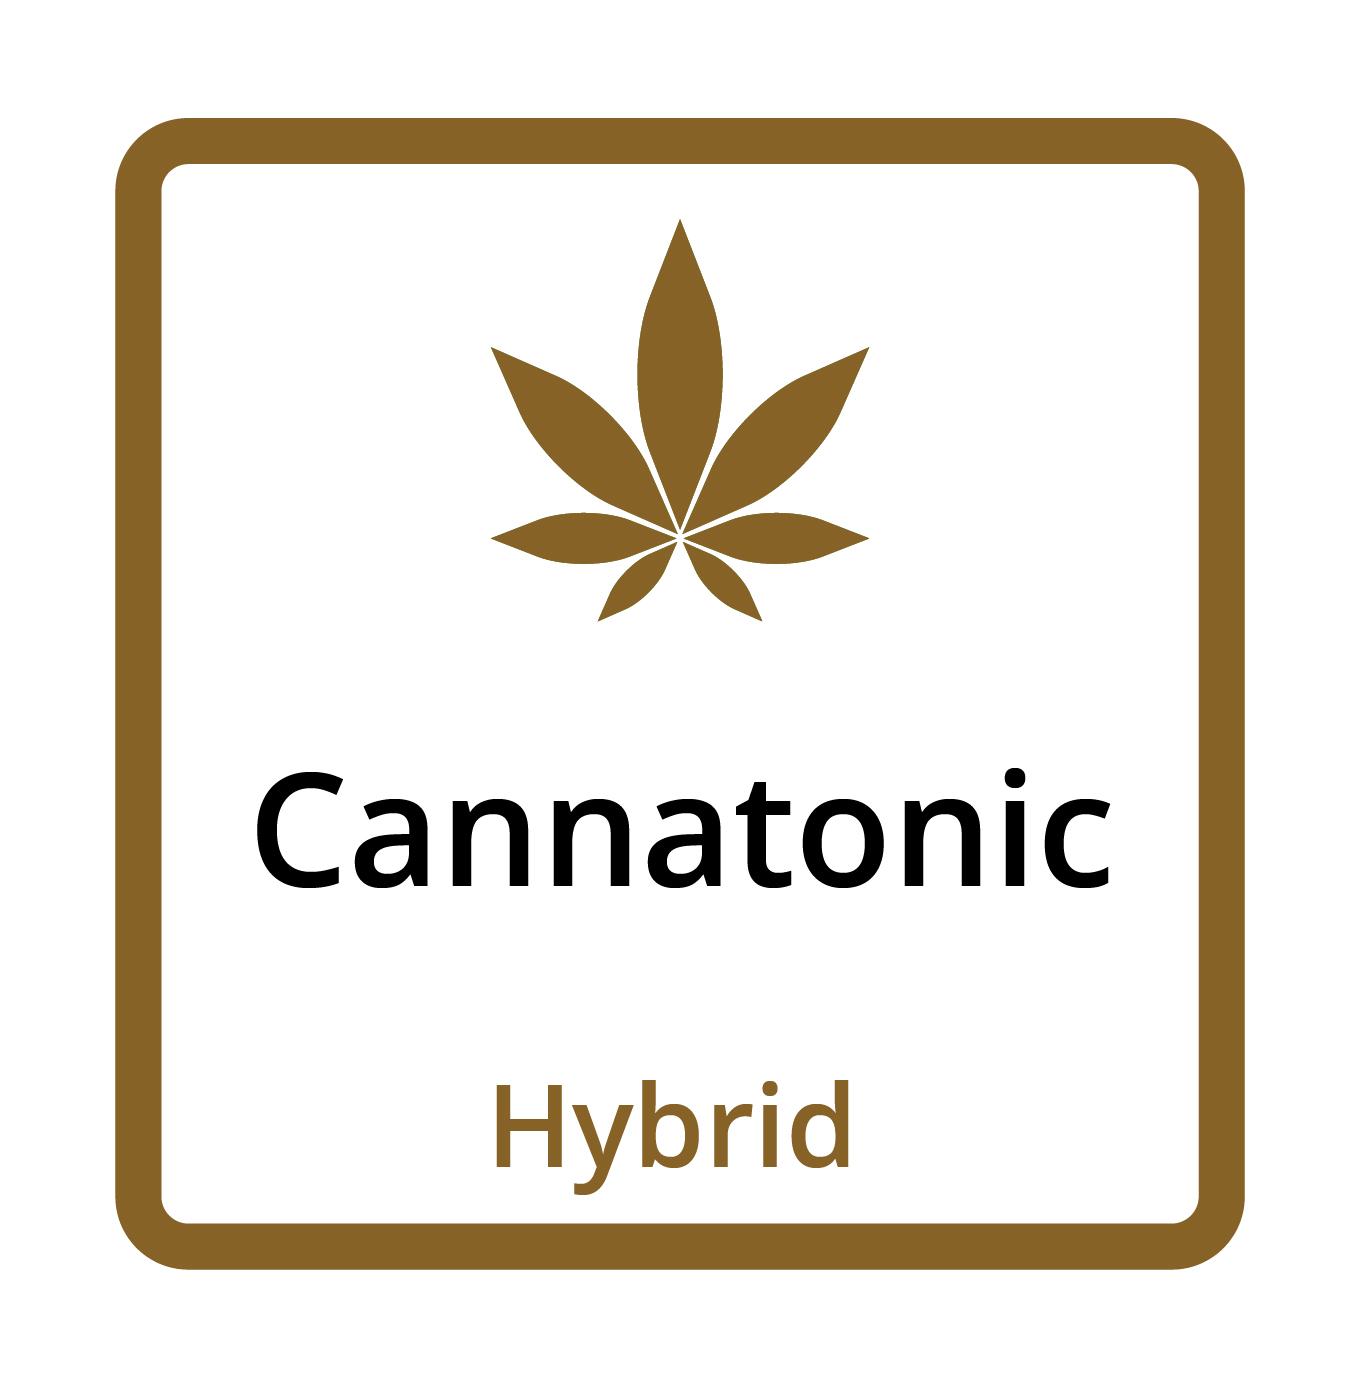 Cannatonic (Hybrid)